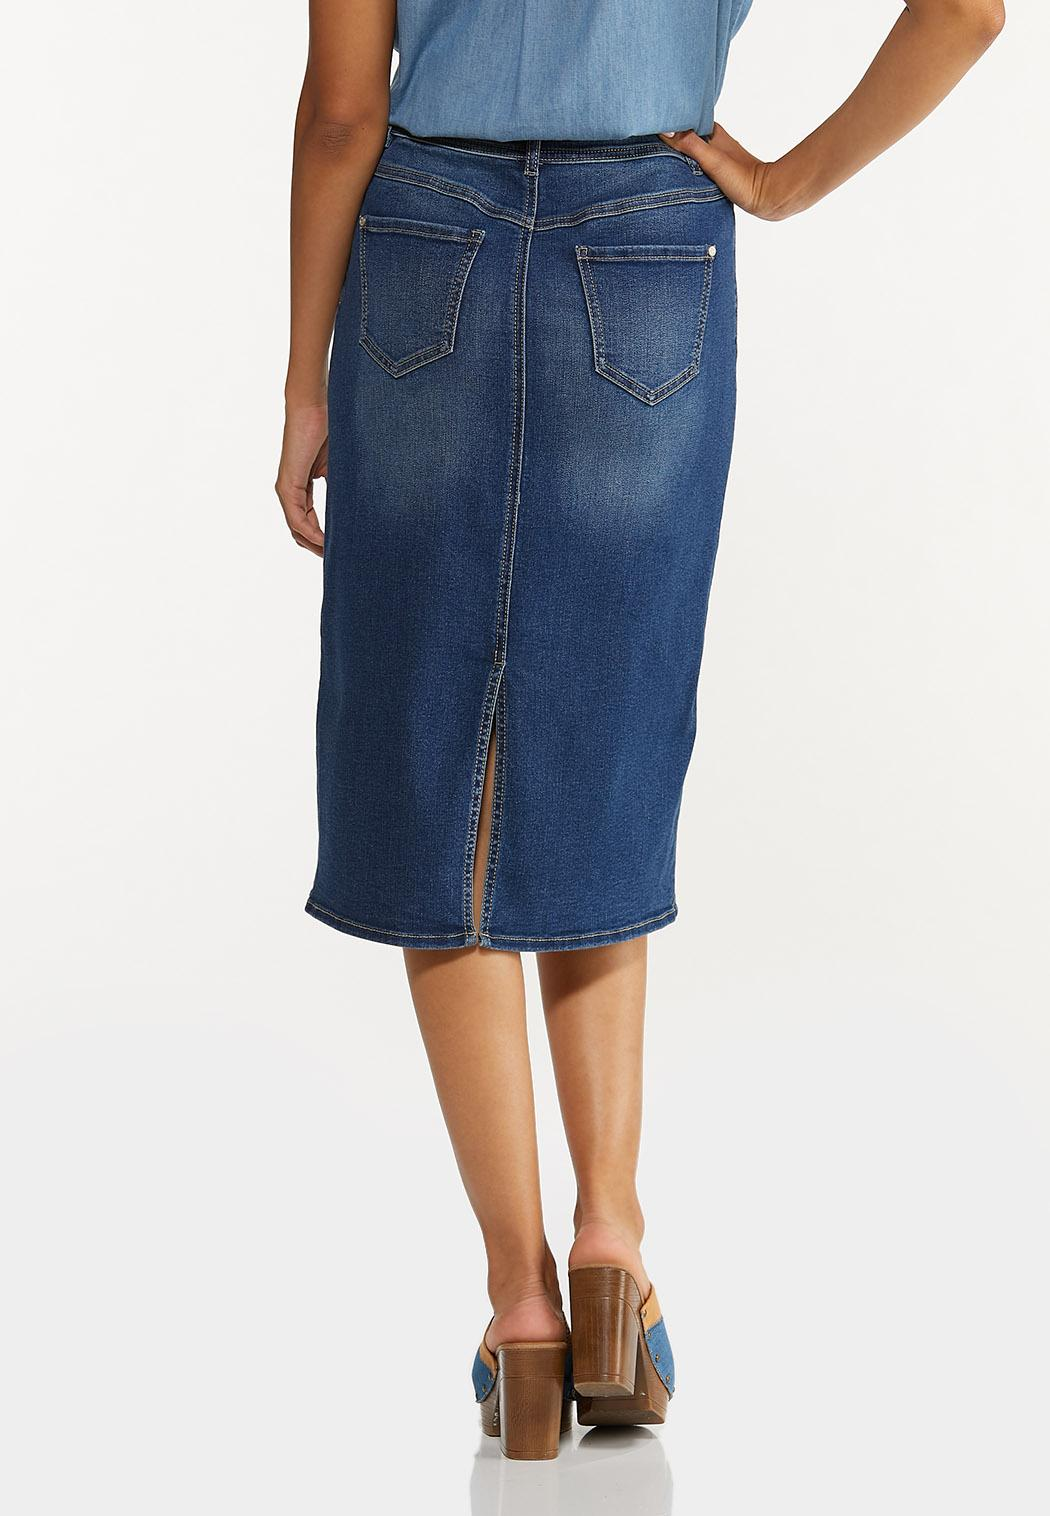 Plus Size Colorblock Denim Skirt (Item #44644033)